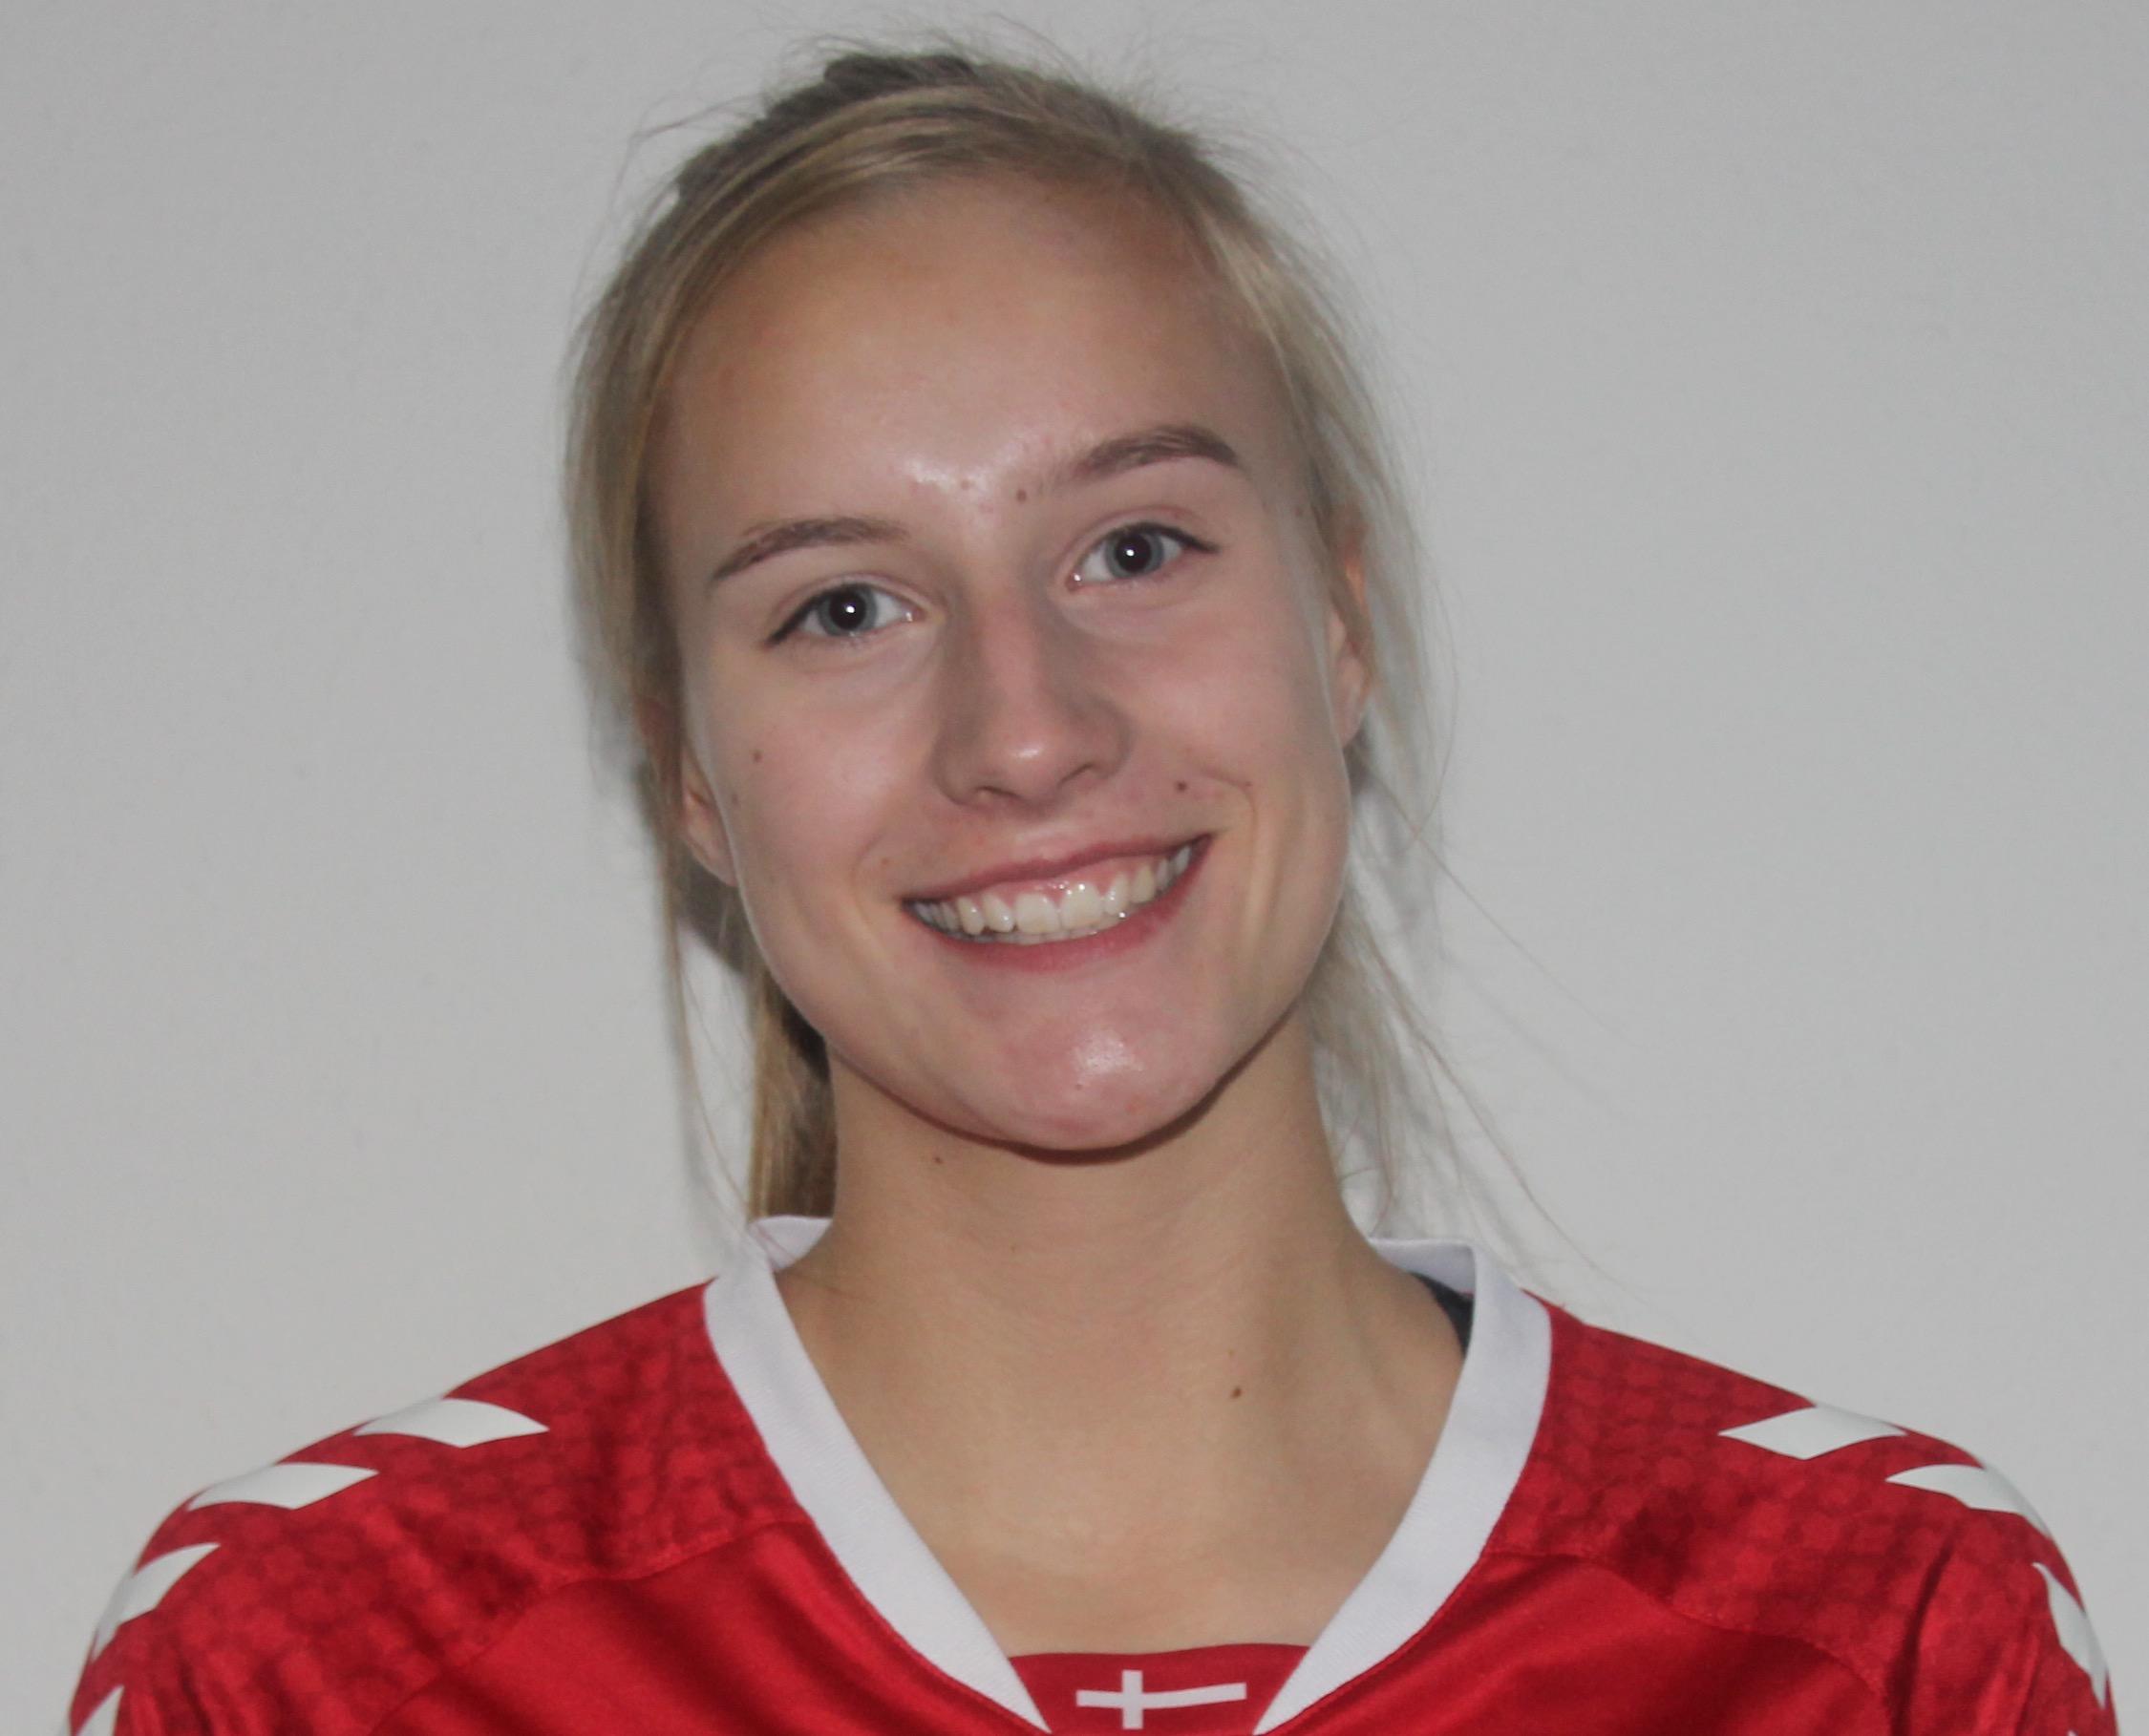 Rikke Søndergaard